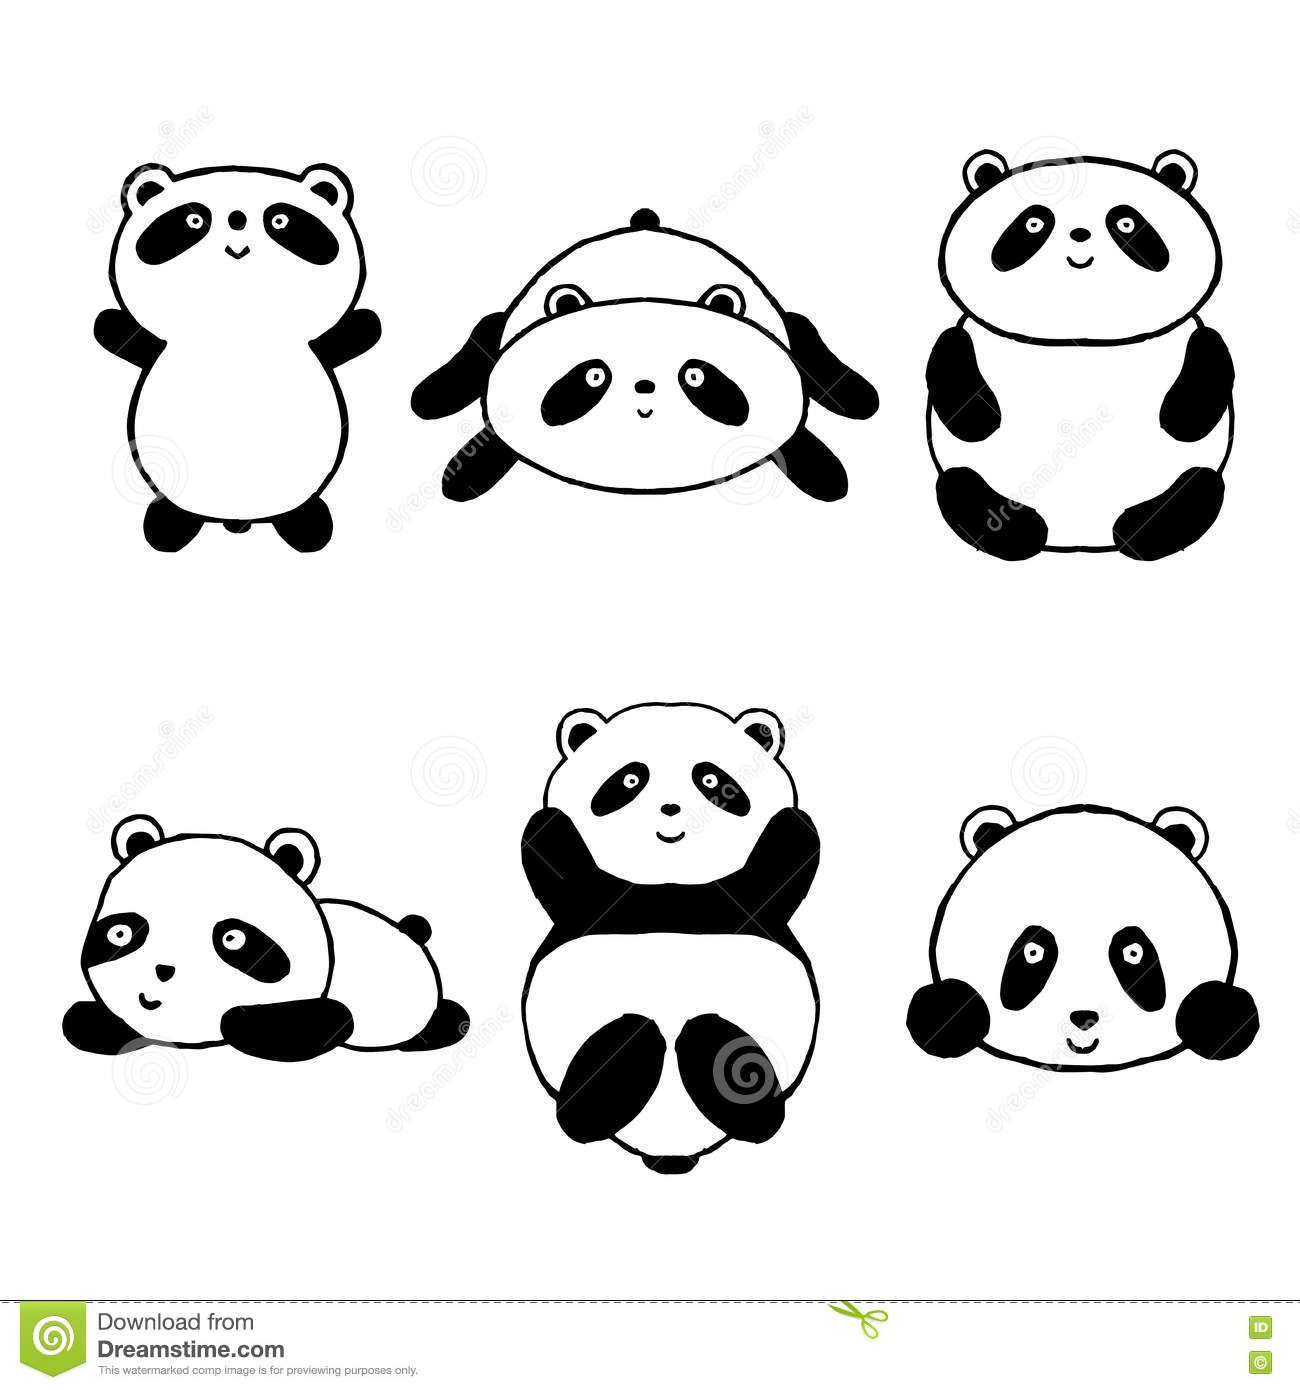 1 Set Kawaii Cartoon Panda Happy Birthday Decoration Set for Kids Nursery Decor